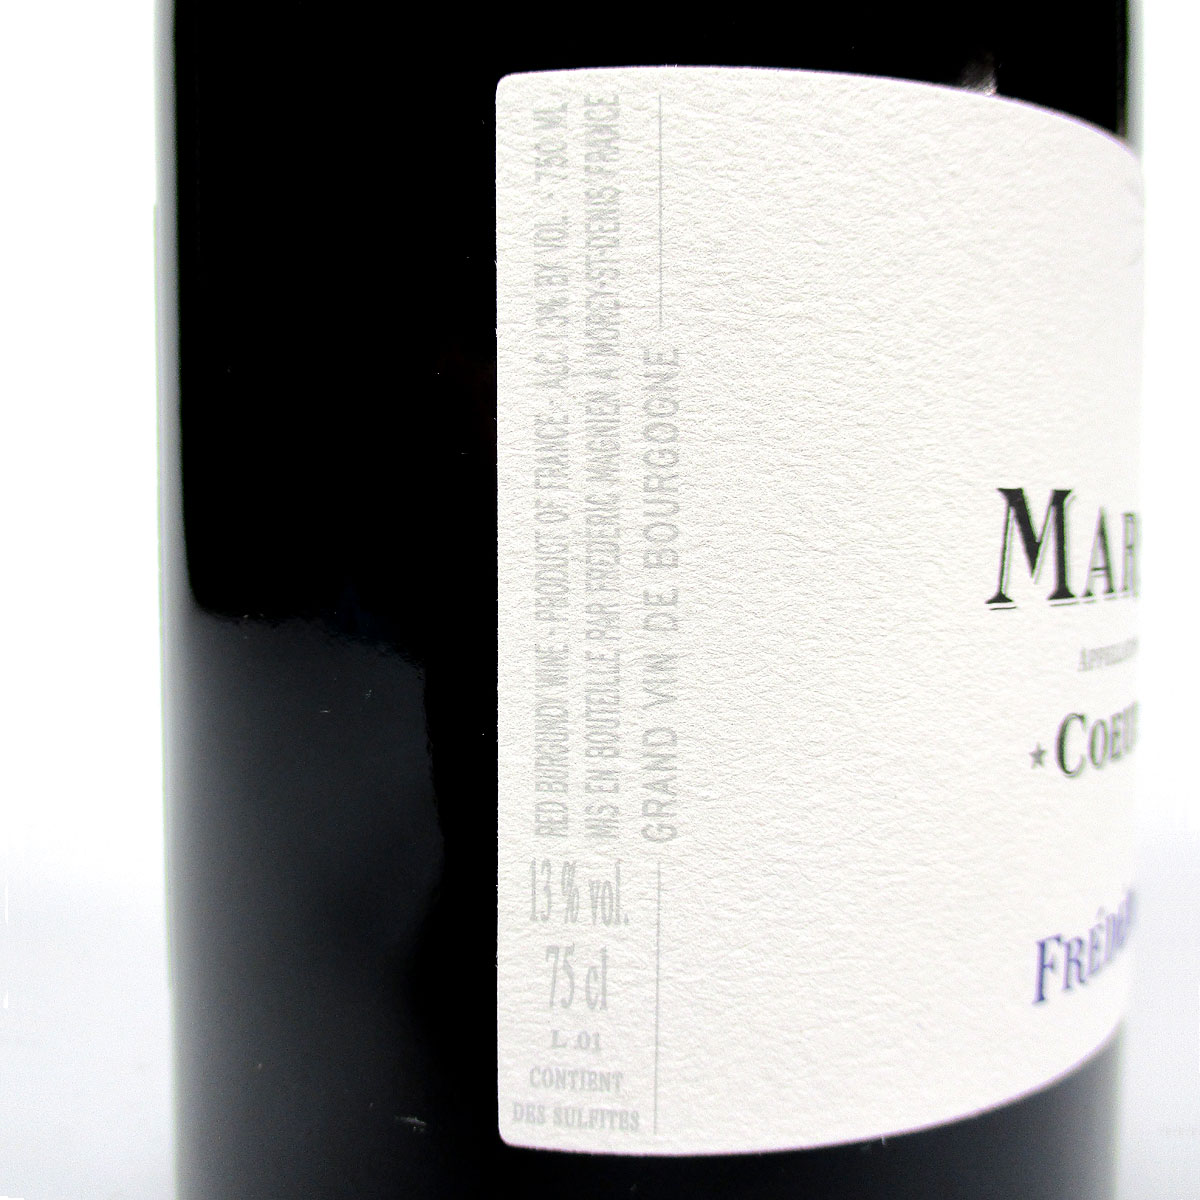 Marsannay: Frédéric Magnien 'Coeur d'Argile' 2017 - Bottle Label Side